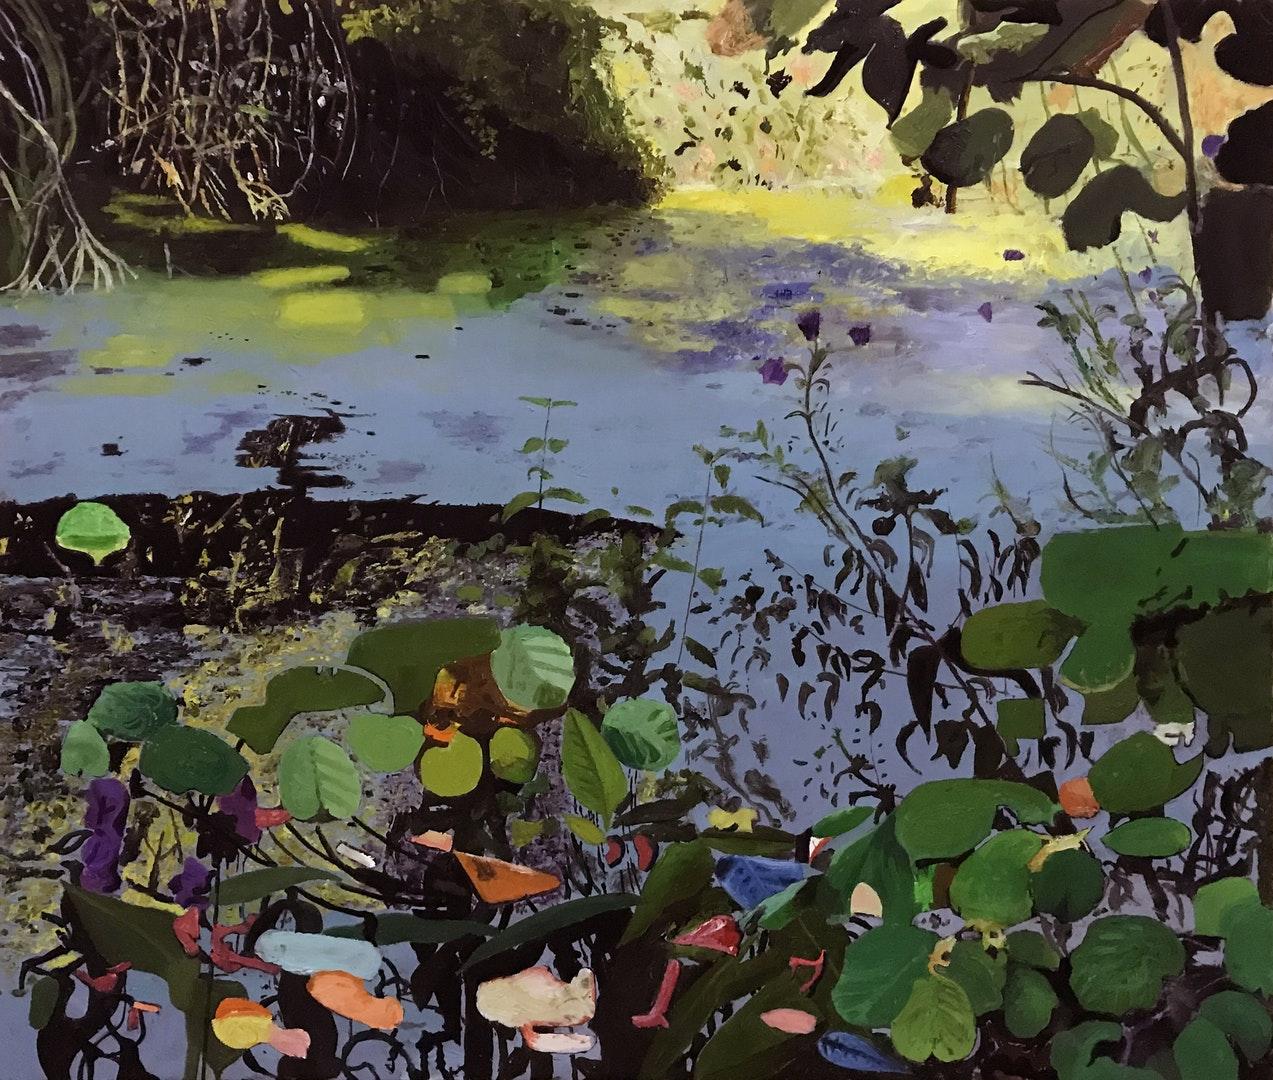 Iain Nicholls, Elsecar Canal, Oil on canvas [JOPP 2019 Winner]